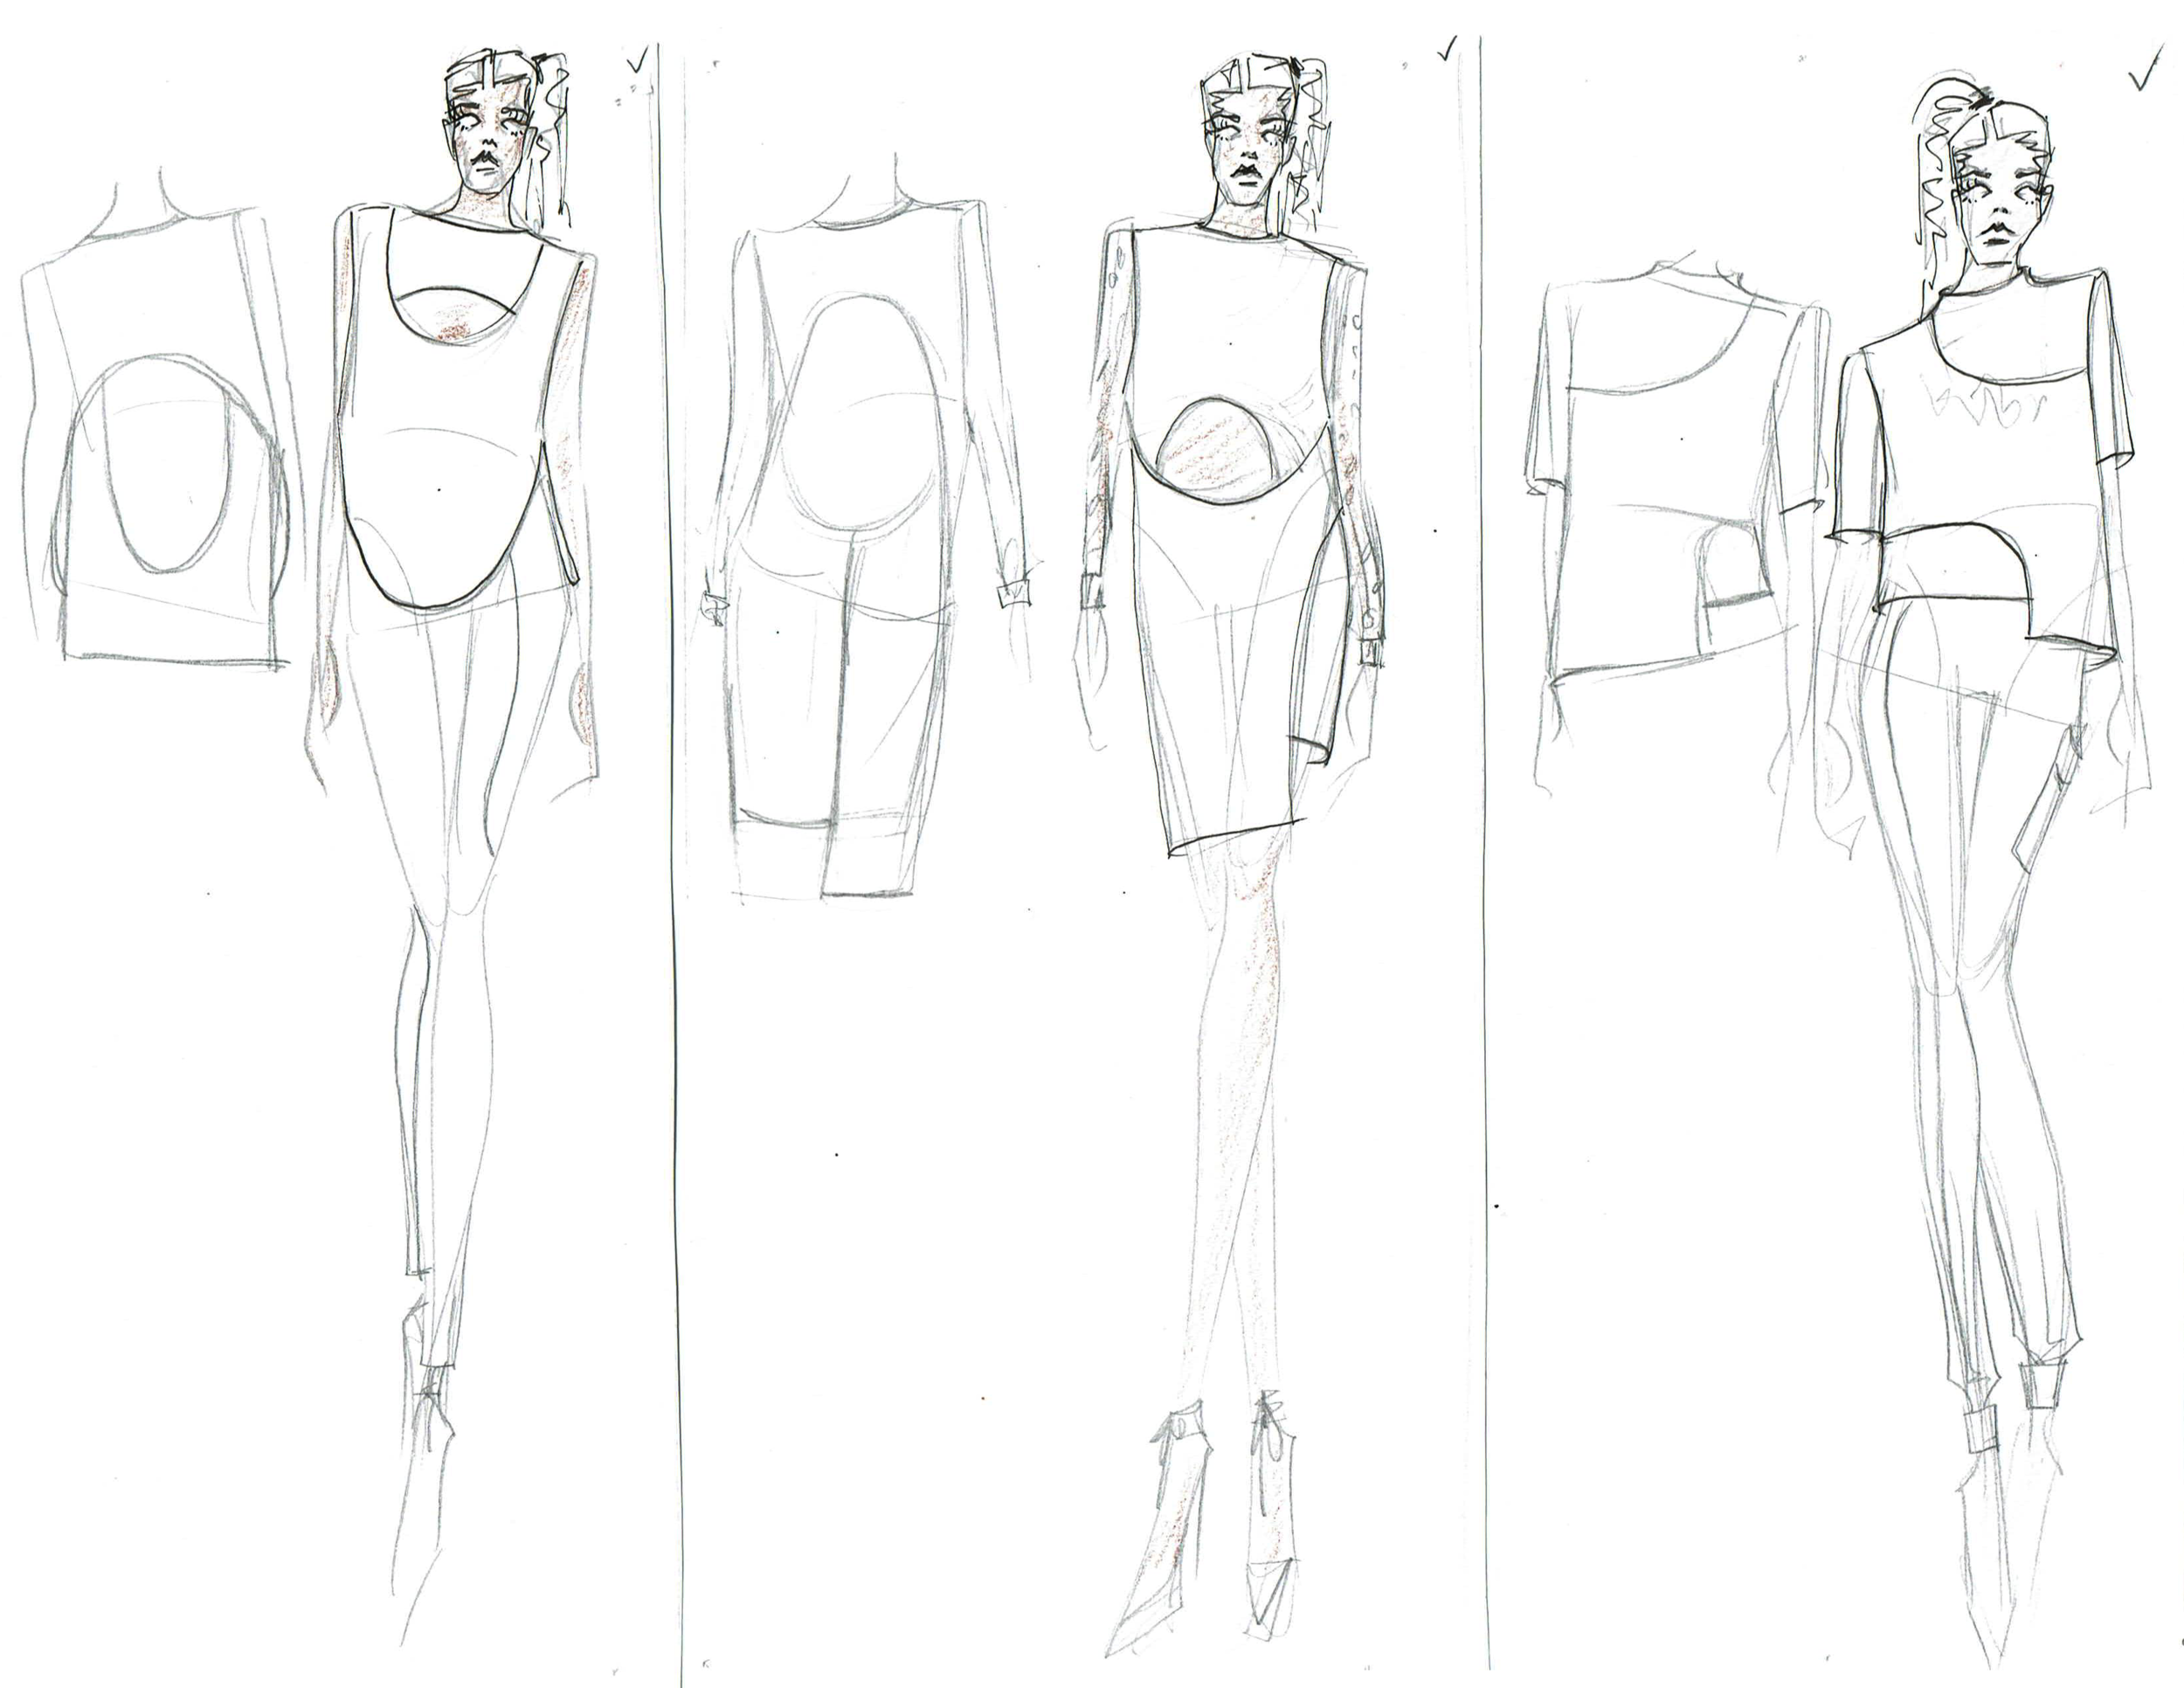 sketches3 copy.png